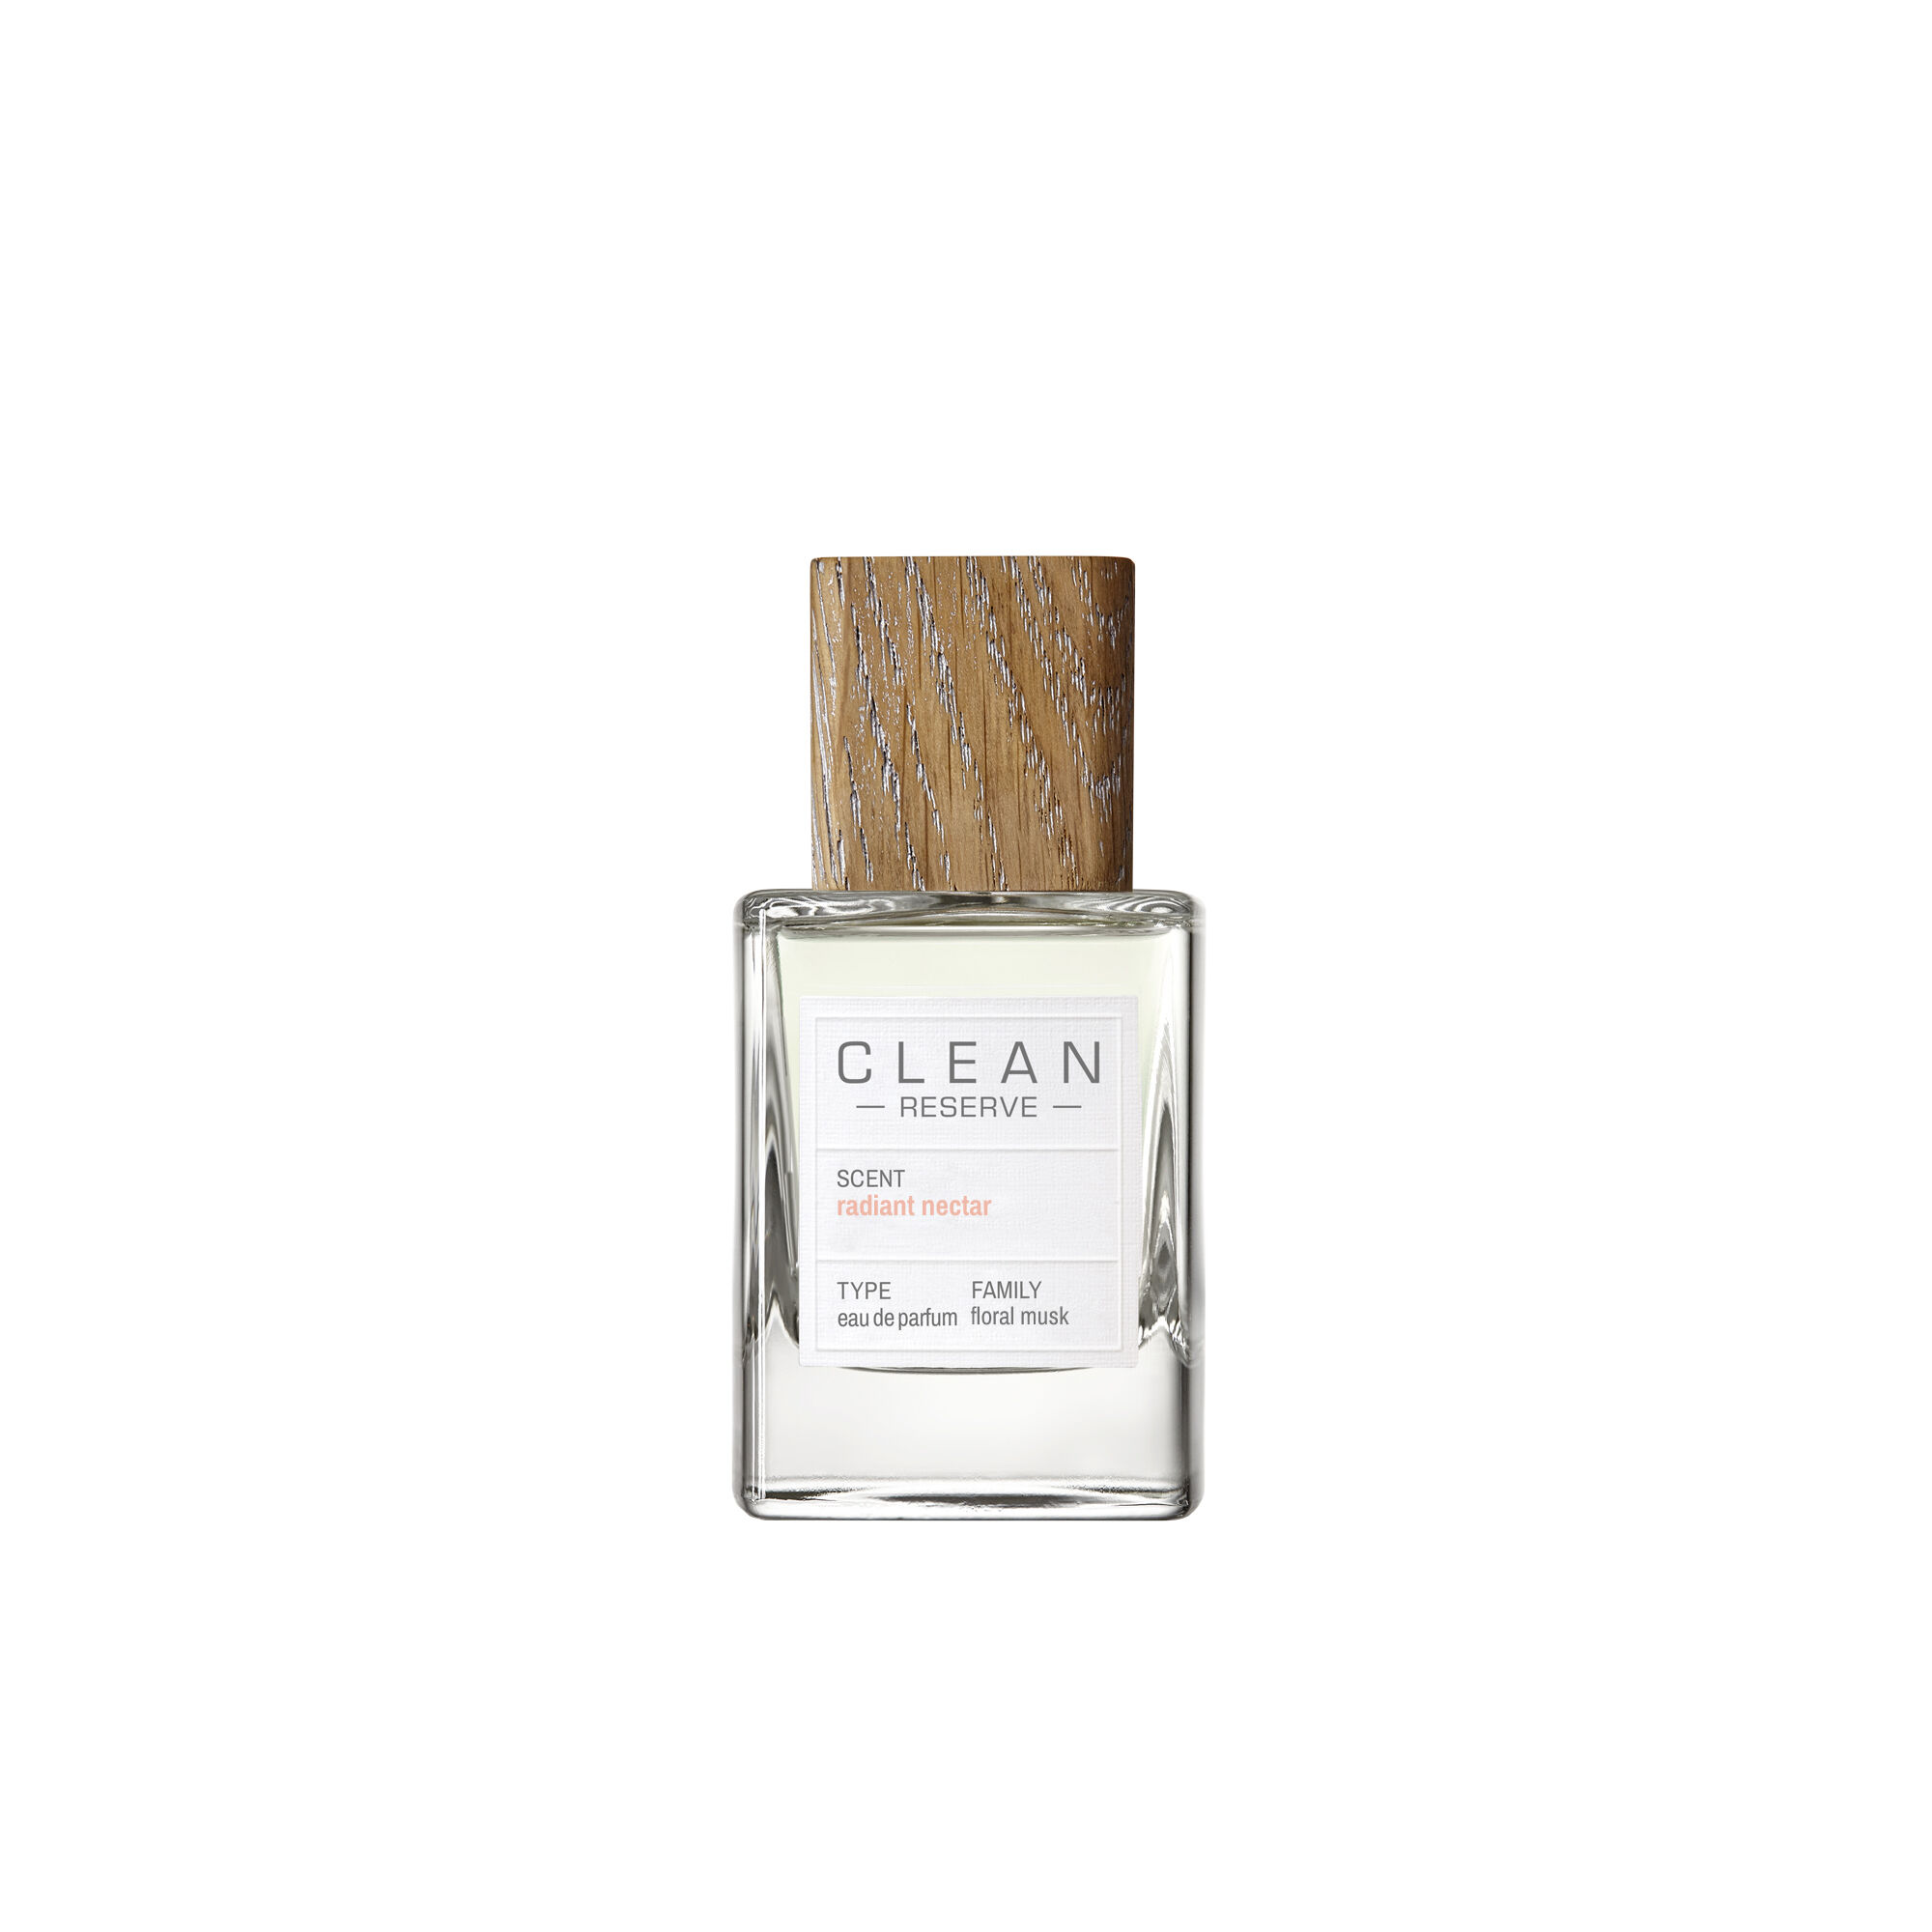 CLEAN Reserve Radiant Nectar EDP 50ml